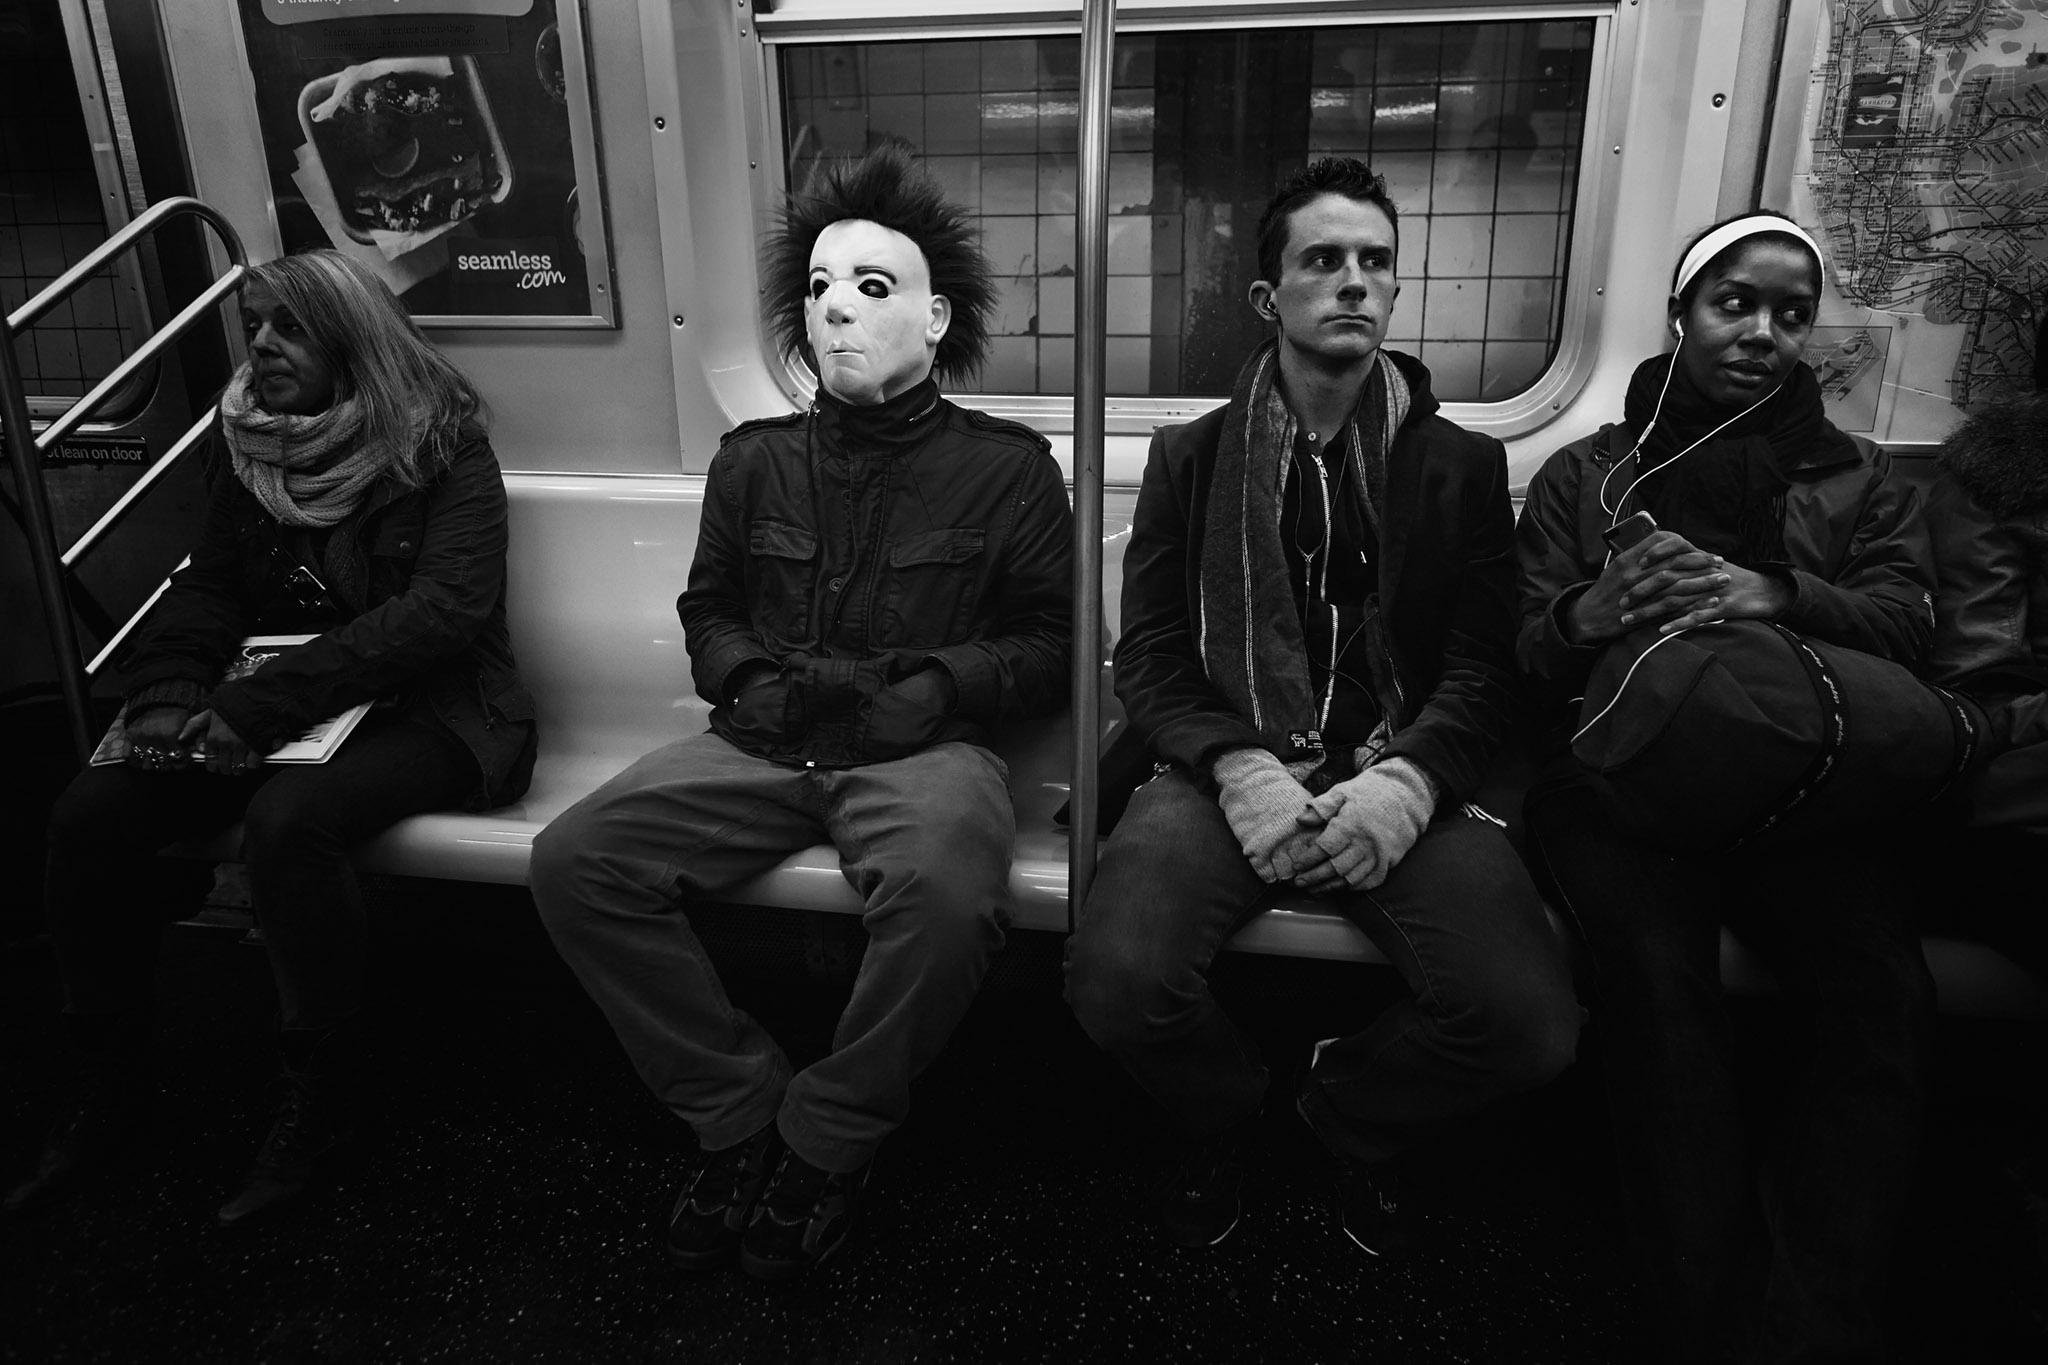 passengers_riding_subway_nyc_halloween